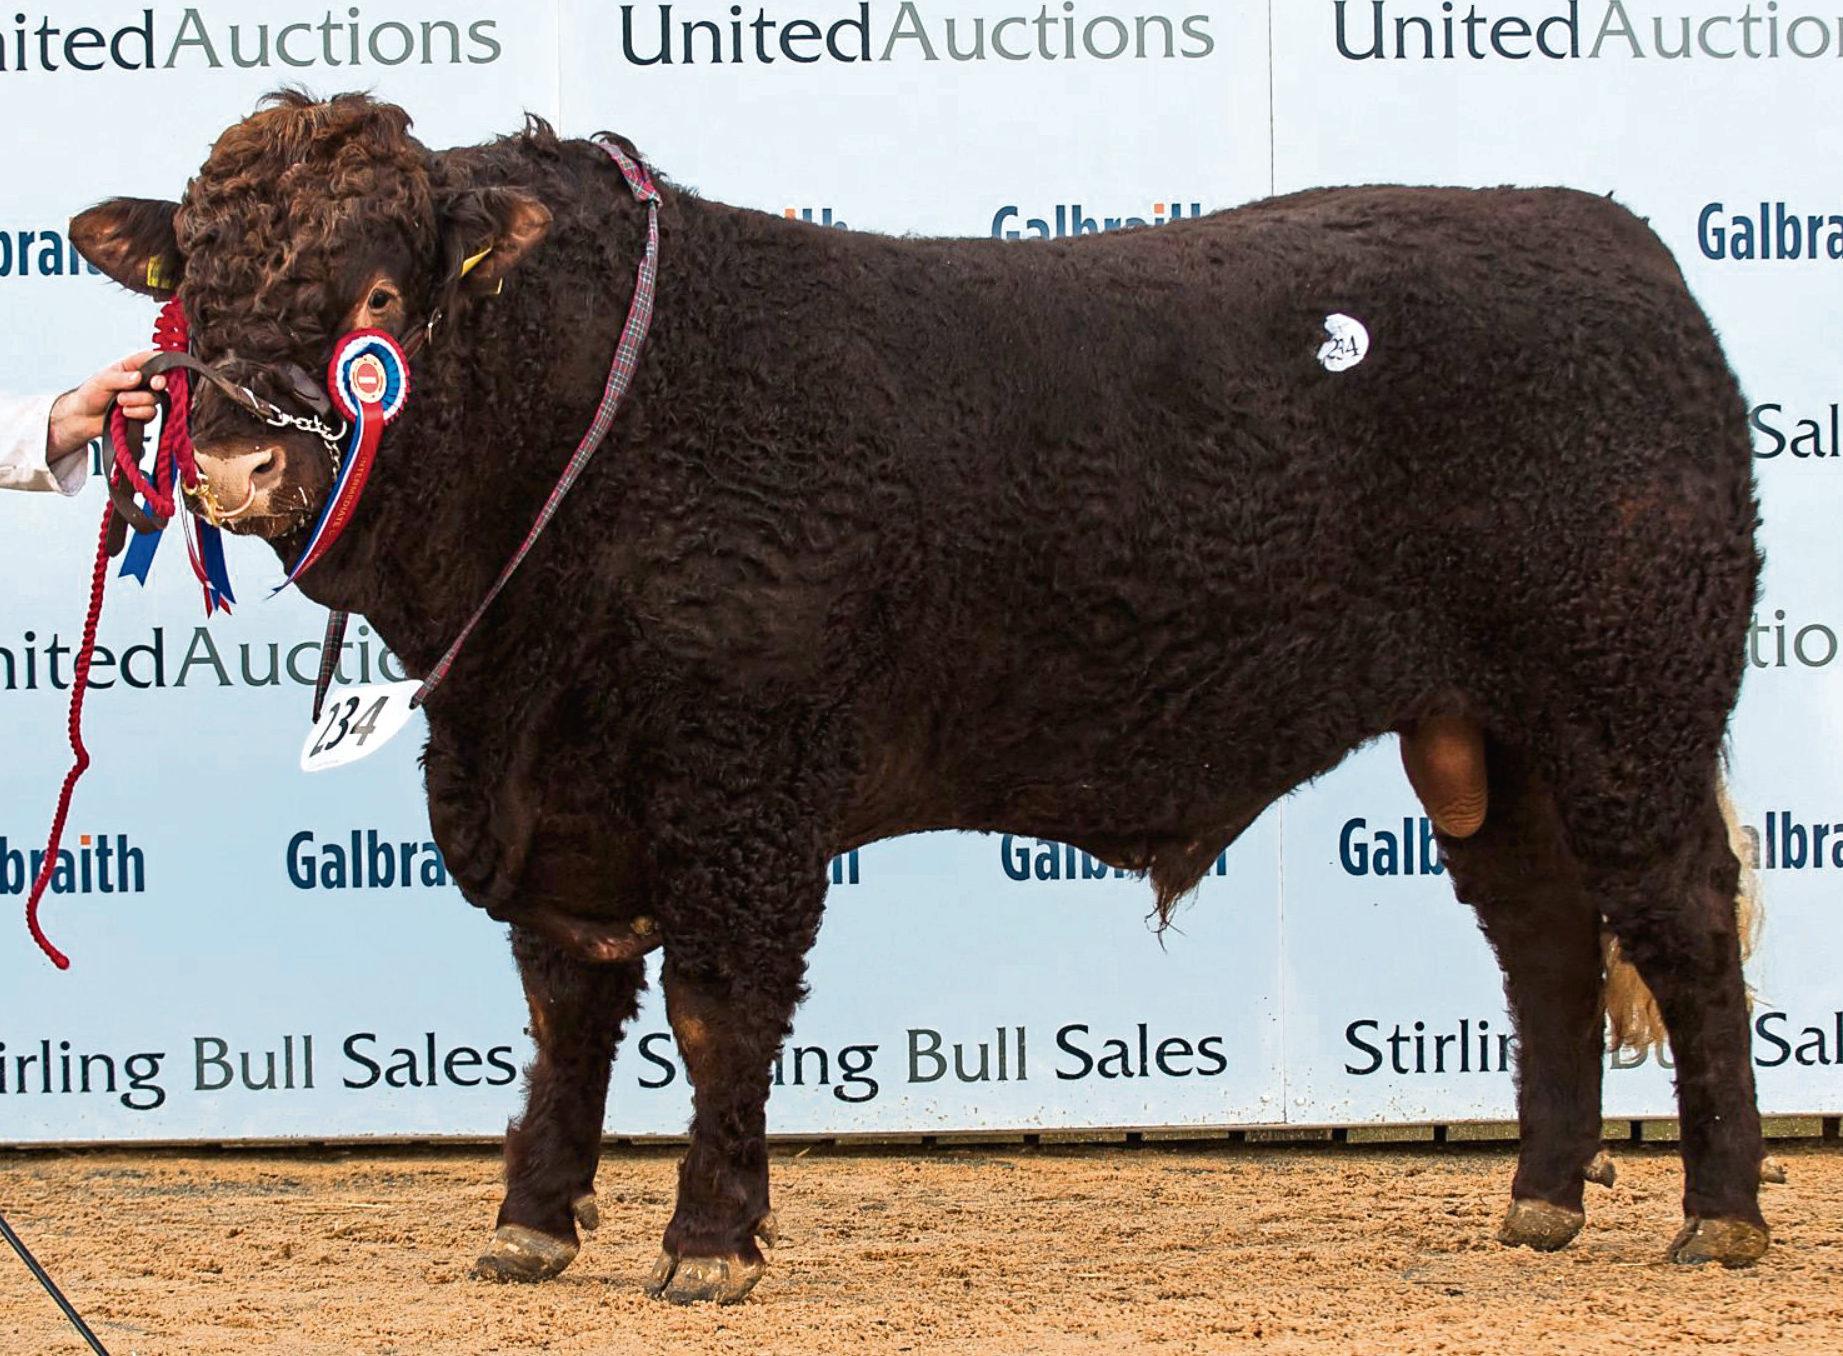 Champion Saler bull, Strathallan Navigator, of Mid Cumbushinnie Farm, Cromlix, Dunblane, raised 8,000gns.